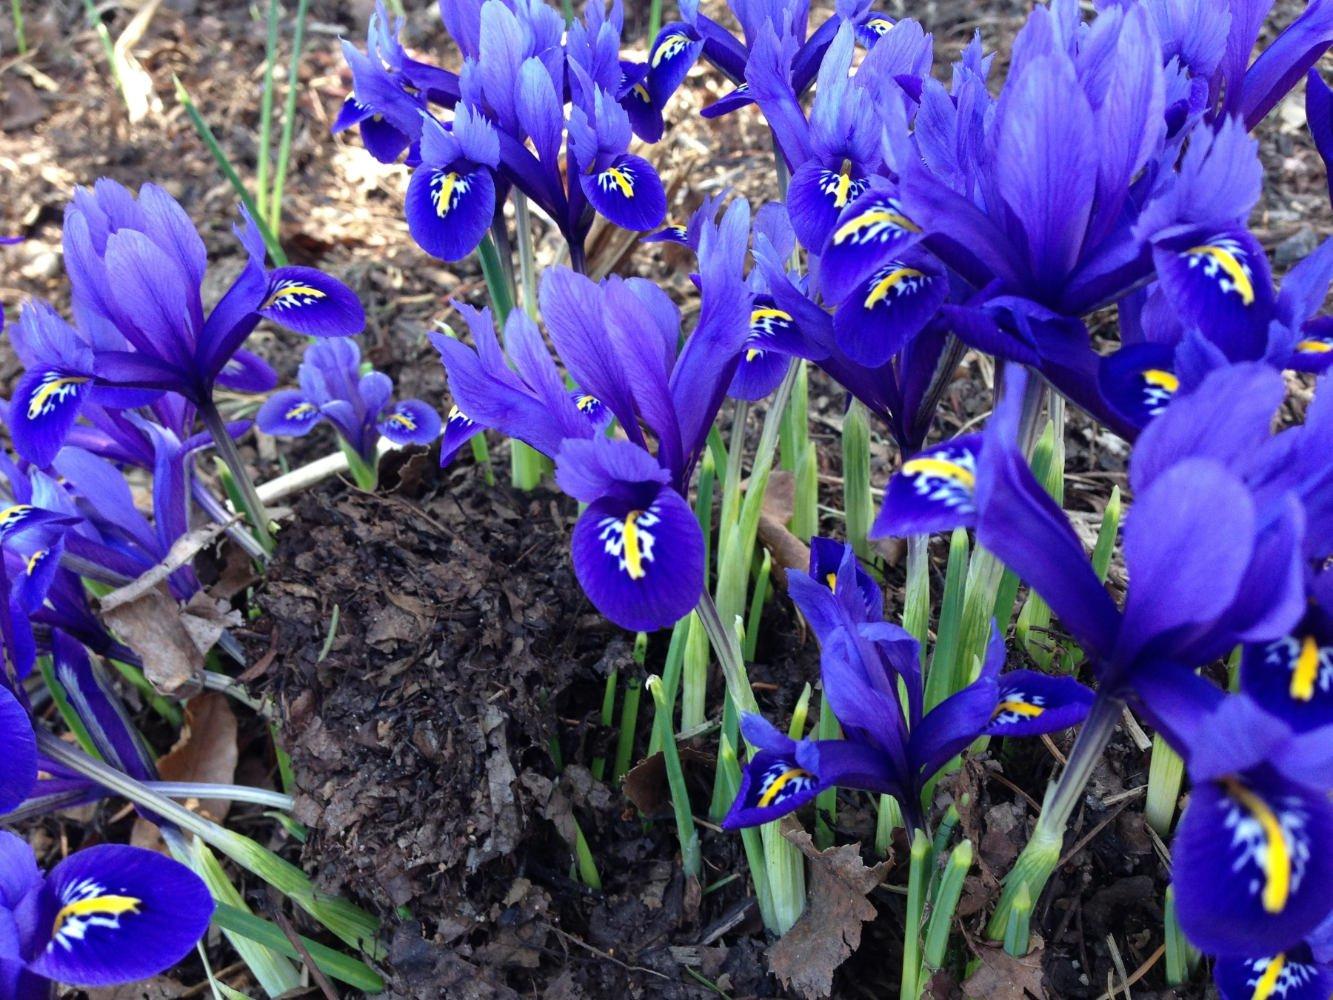 A growing garden of blooming purple iris